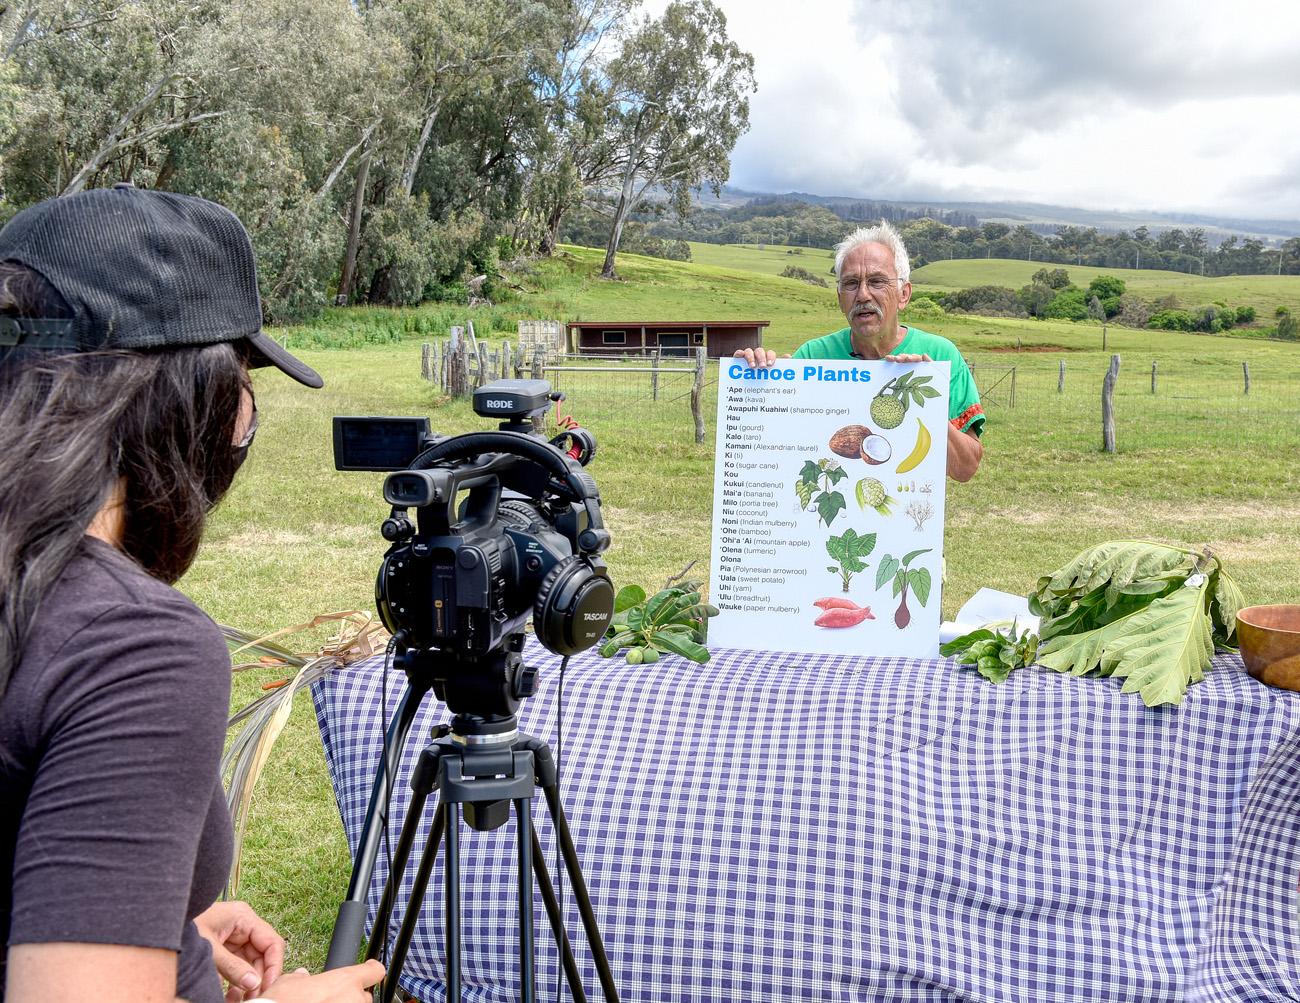 Farm Bureau Presents 'Ag in Classroom' Video & Activity Booklet for Maui Second Graders